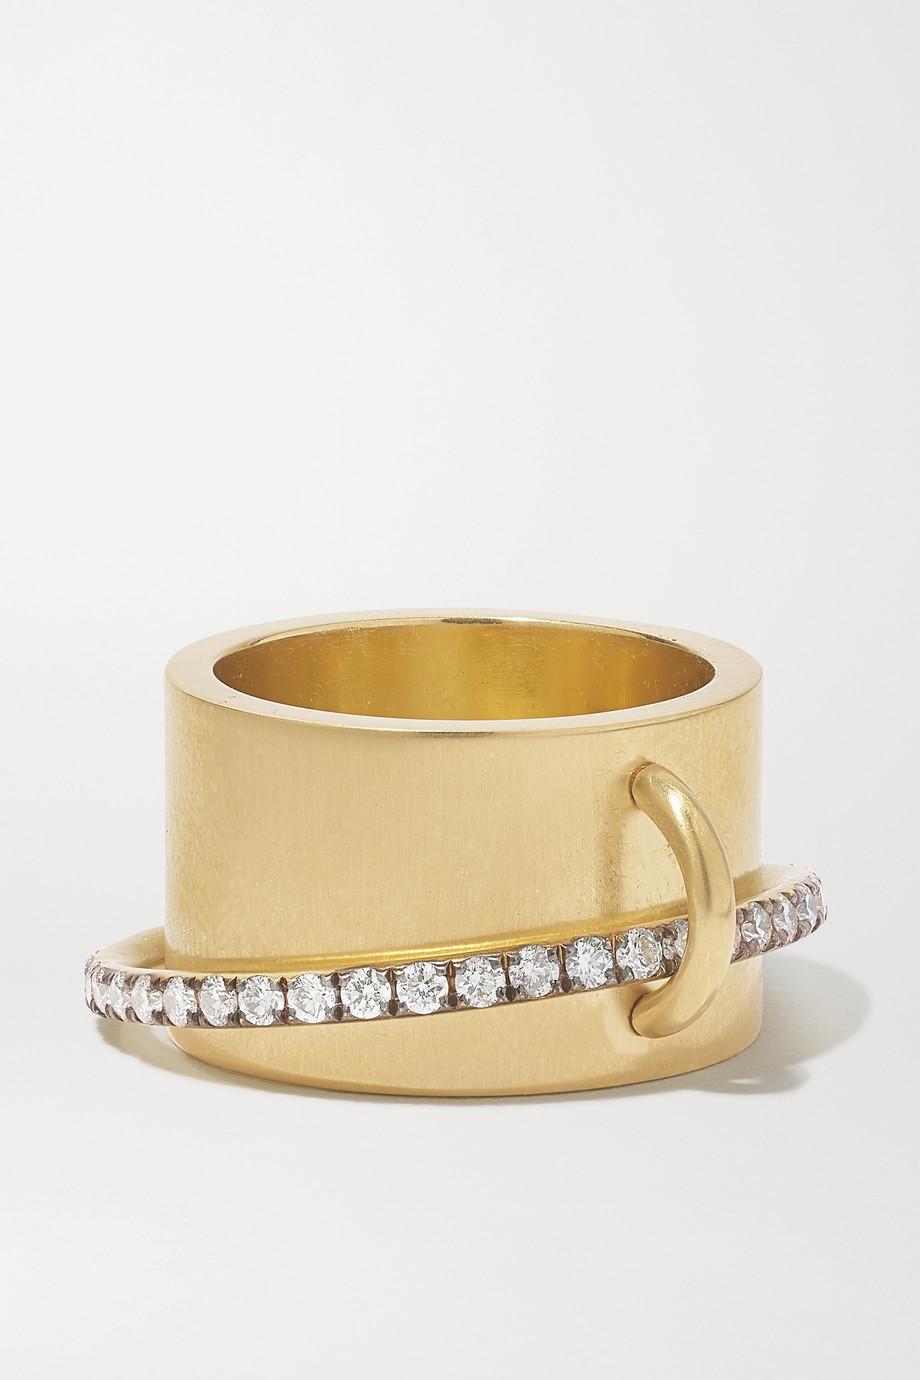 Sylva & Cie 18-karat gold diamond ring